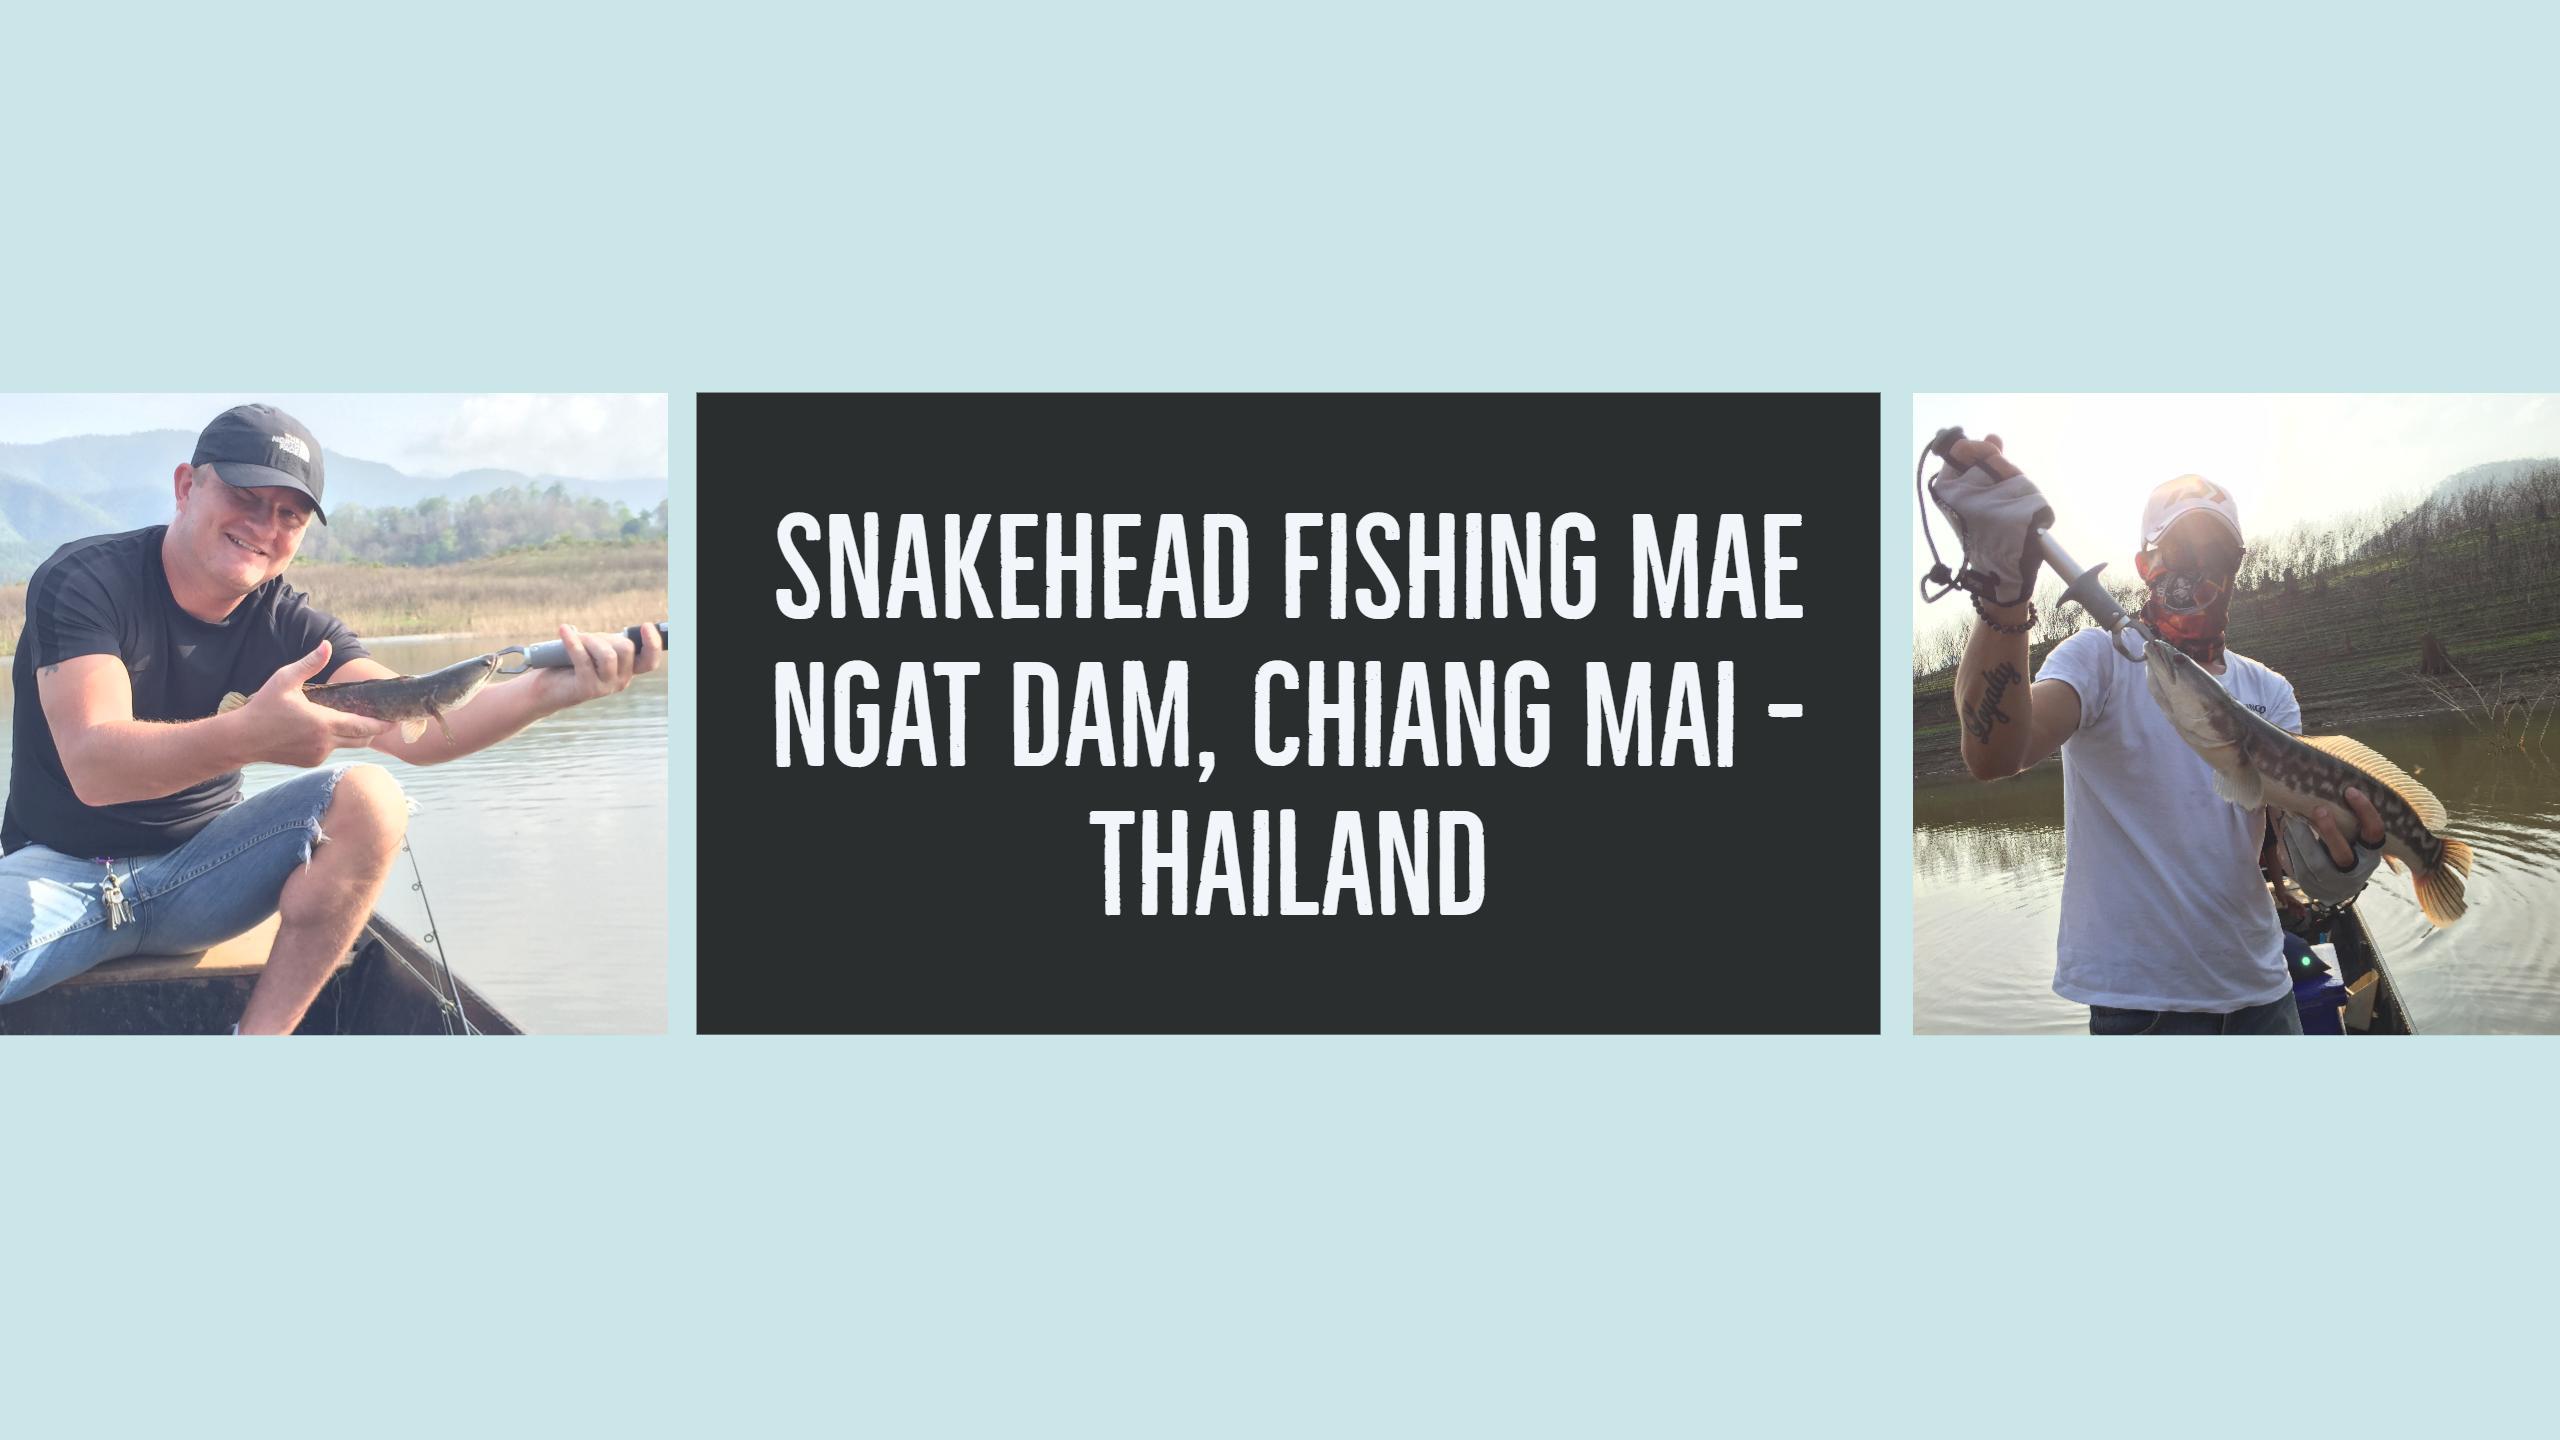 Snakehead Fishing Mae Ngat Dam, Chiang Mai - Thailand